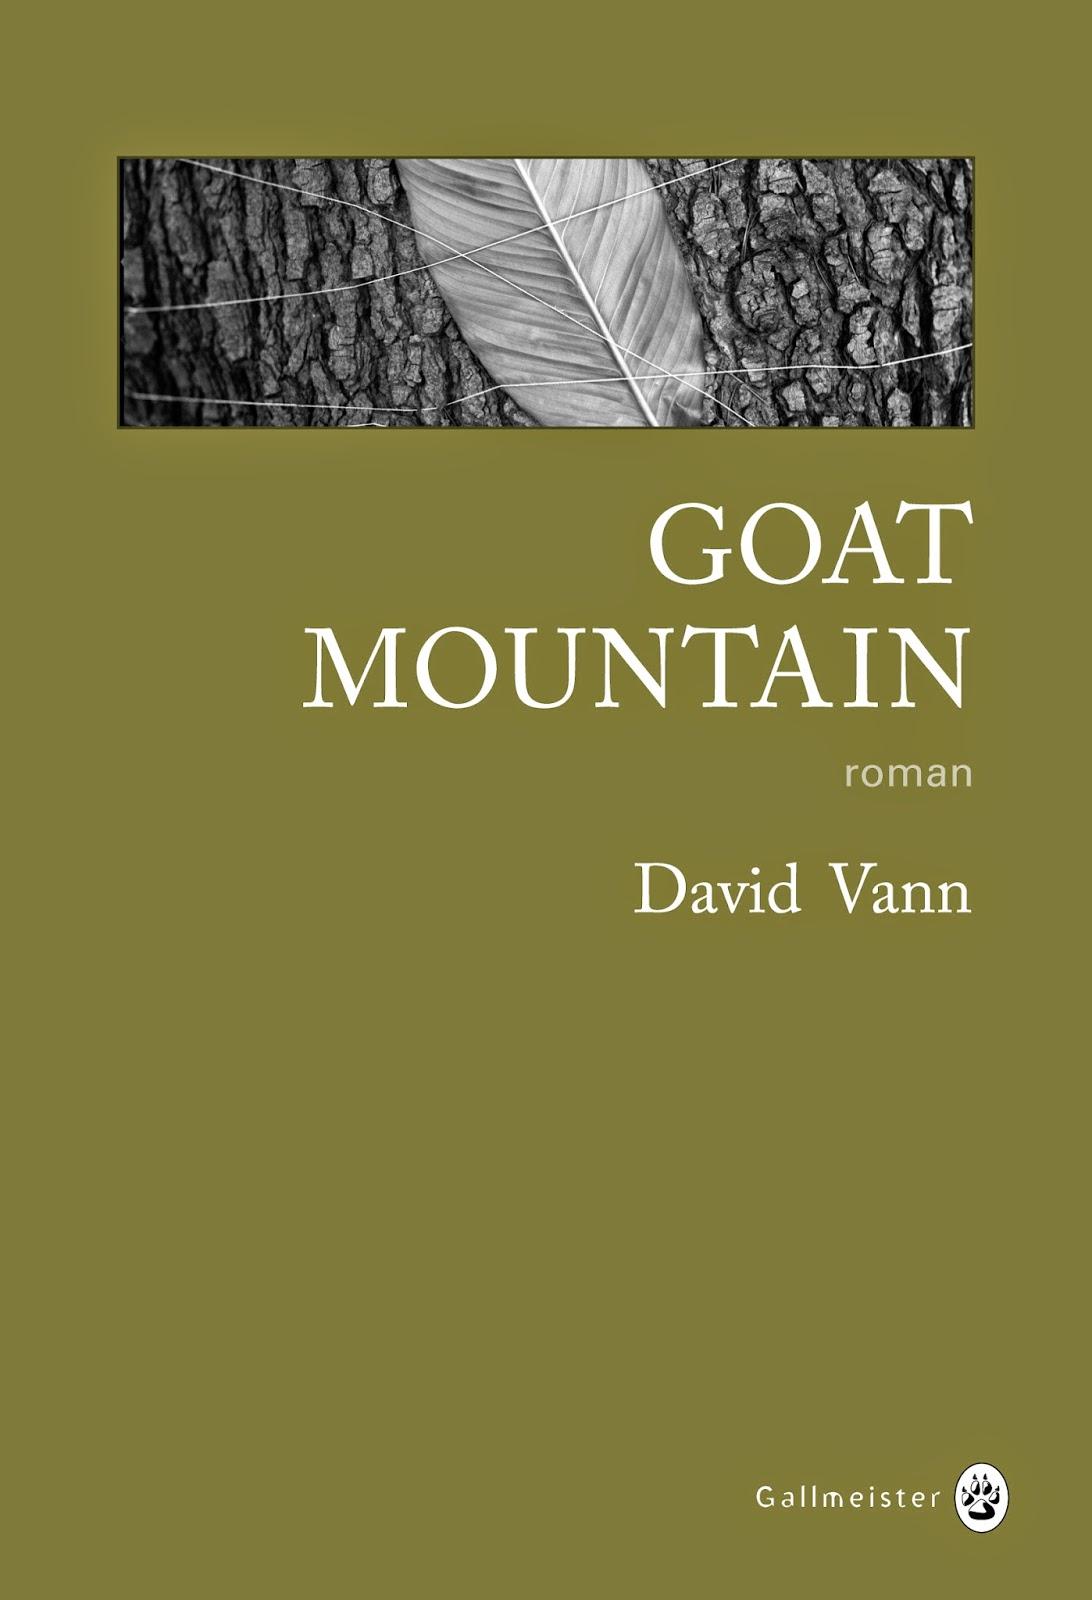 Goat Mountain - David Vann - Editions Gallmeister - 2014 - Traduction de l'américain par Laura Derajinski.